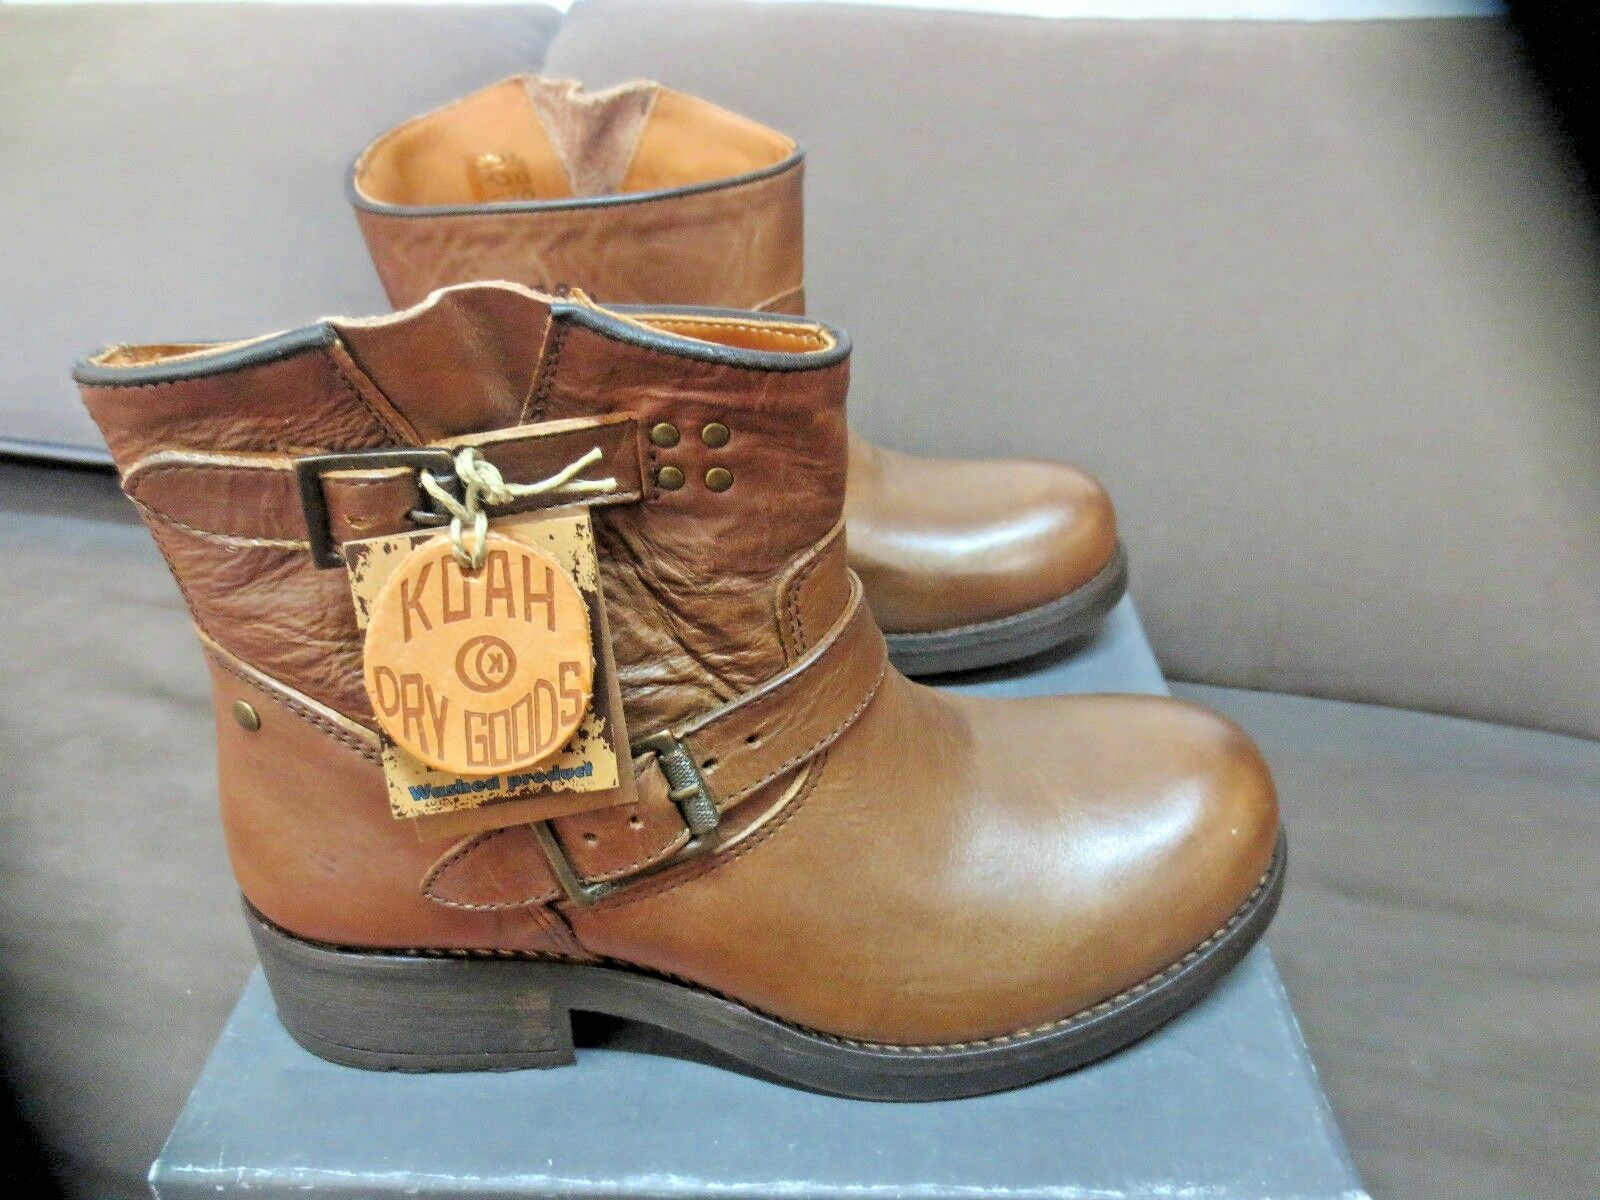 prezzi equi Koah stivali cuir beige NEUVE Valeur 179E Pointures ,40. ,40. ,40.  a prezzi accessibili